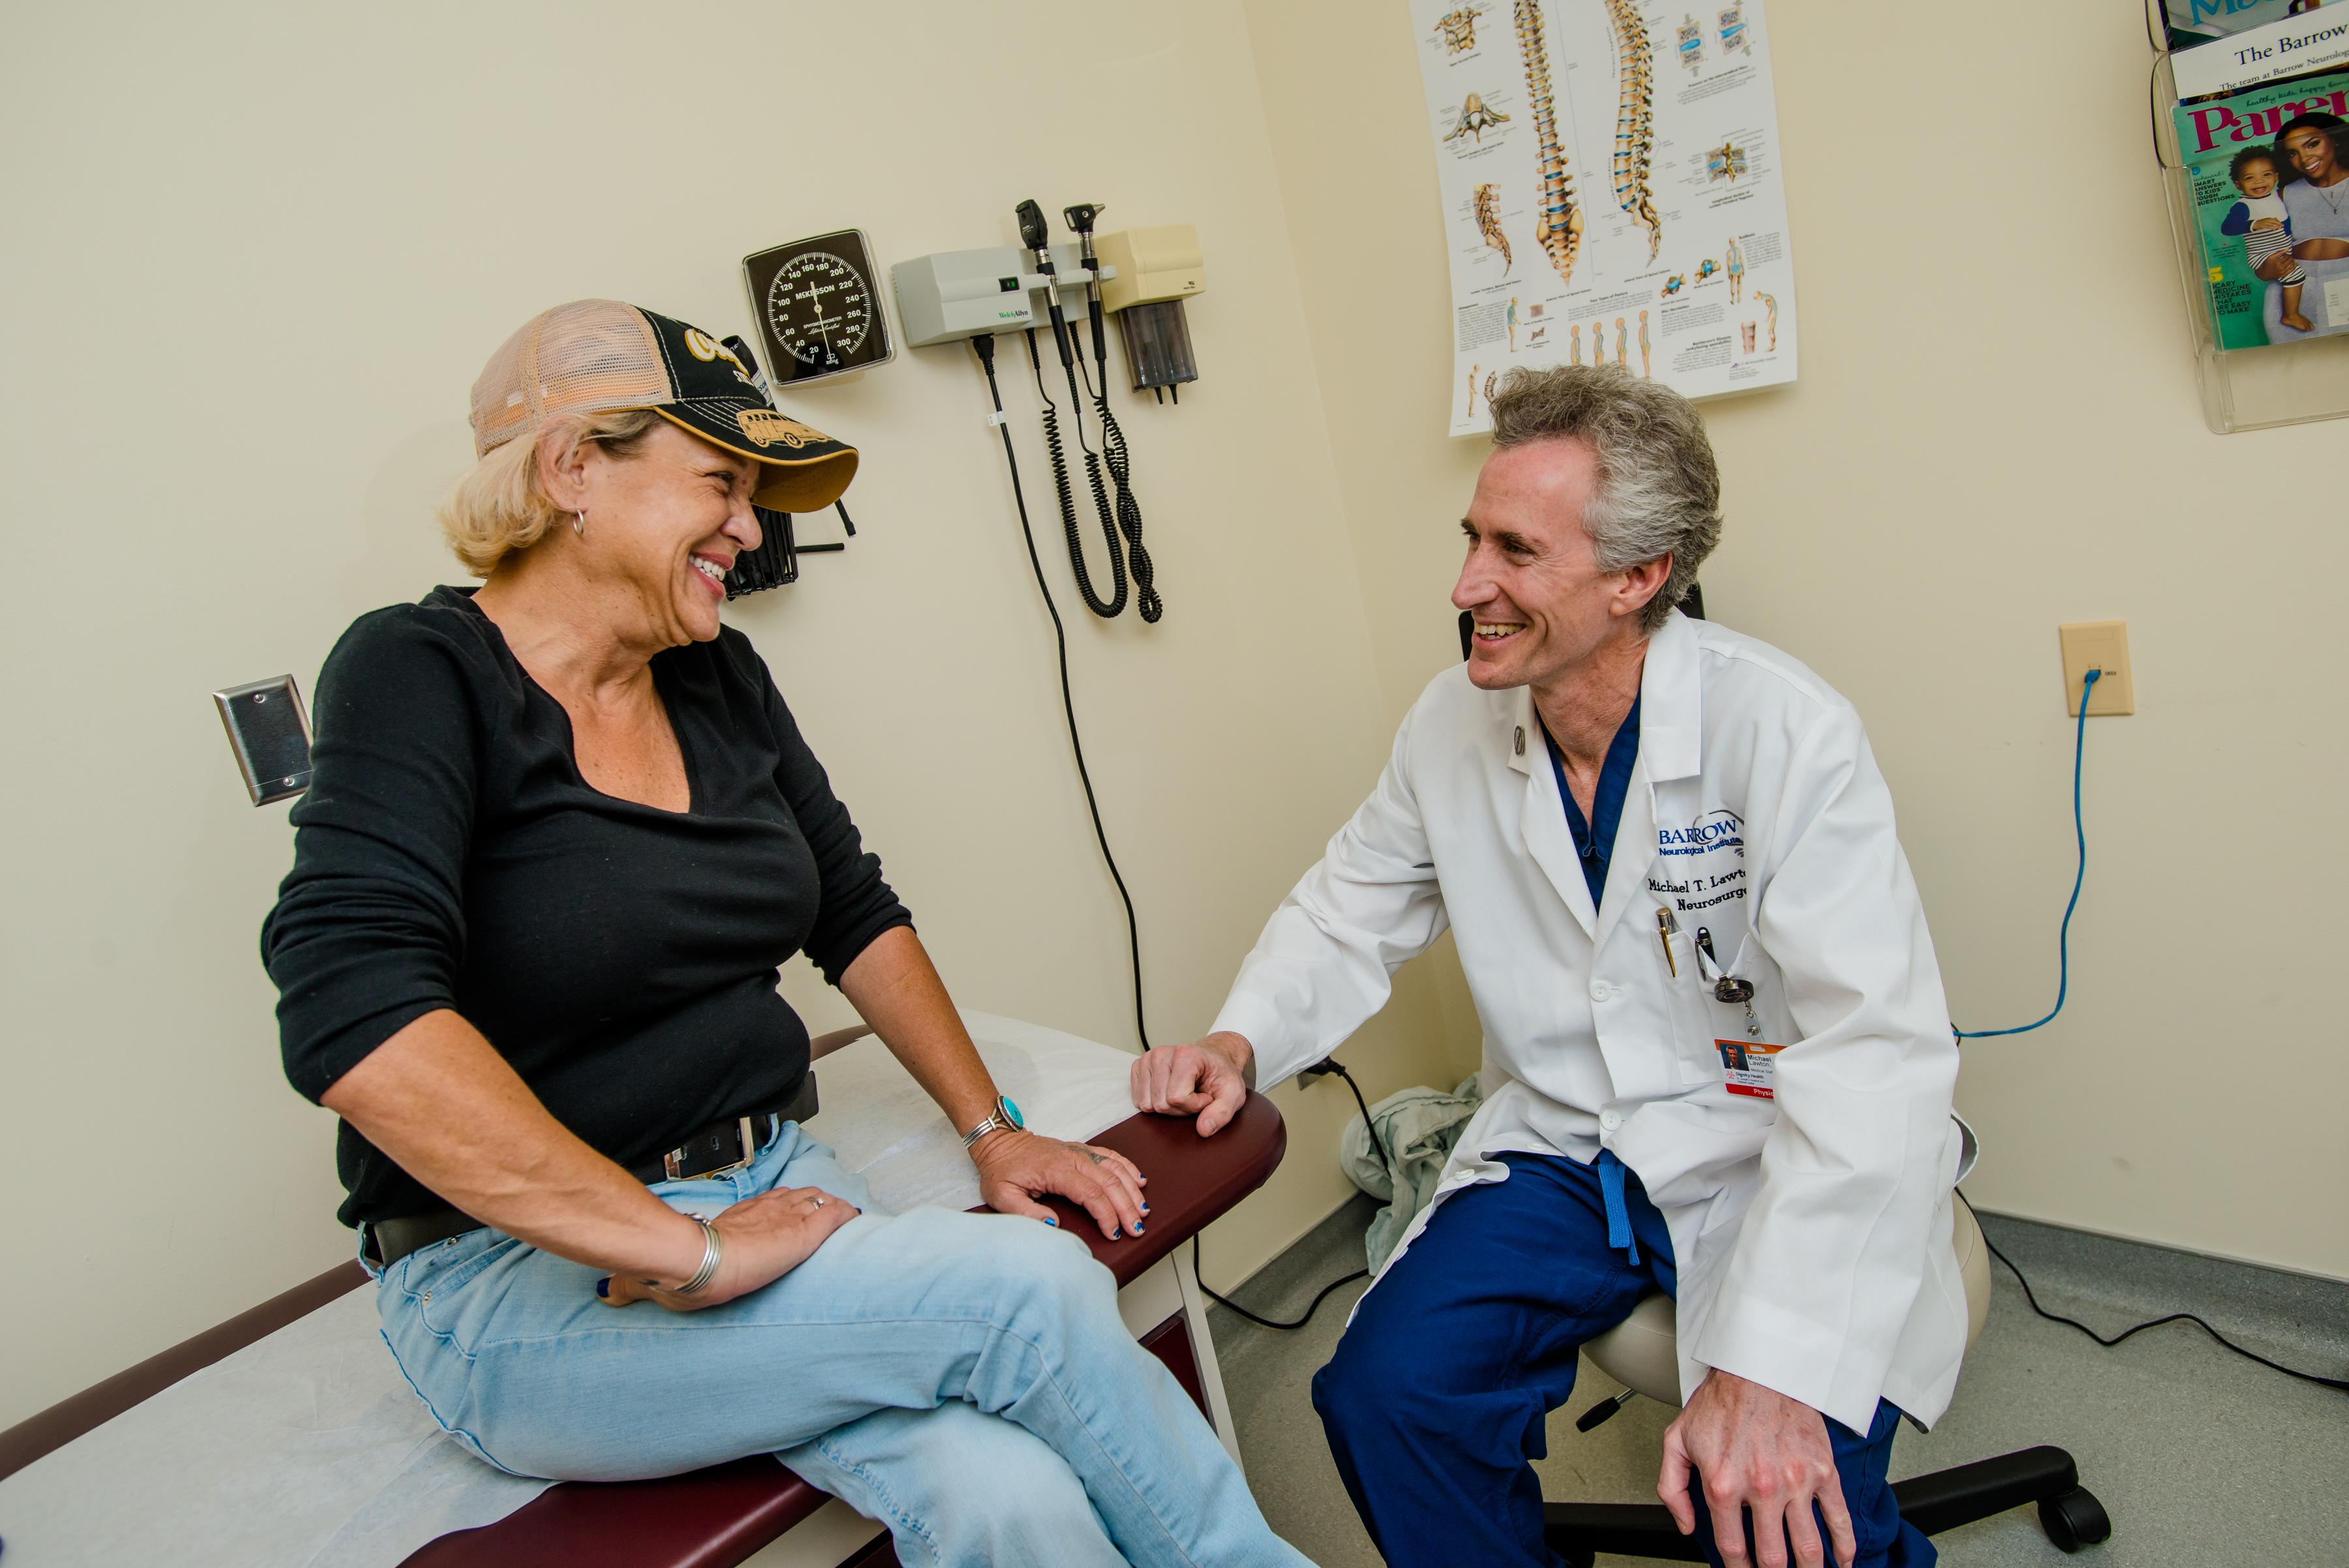 Dr. Lawton talking to patient